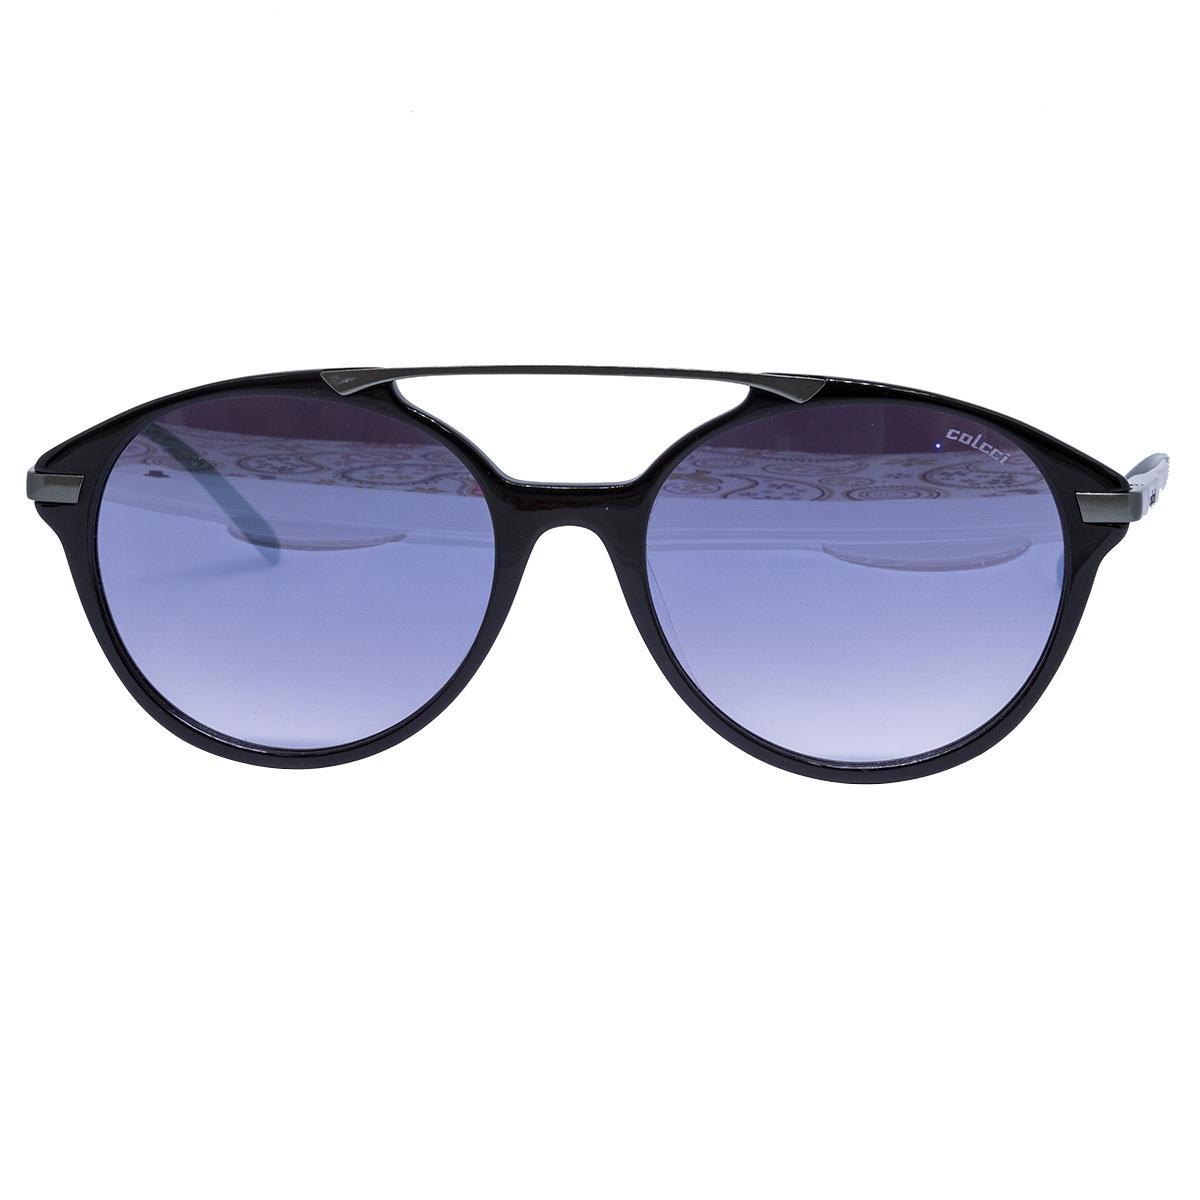 b057861c40e36 Óculos de Sol Colcci Feminino C0069 CA89 43 - Acetato Preto e Metal Bronze